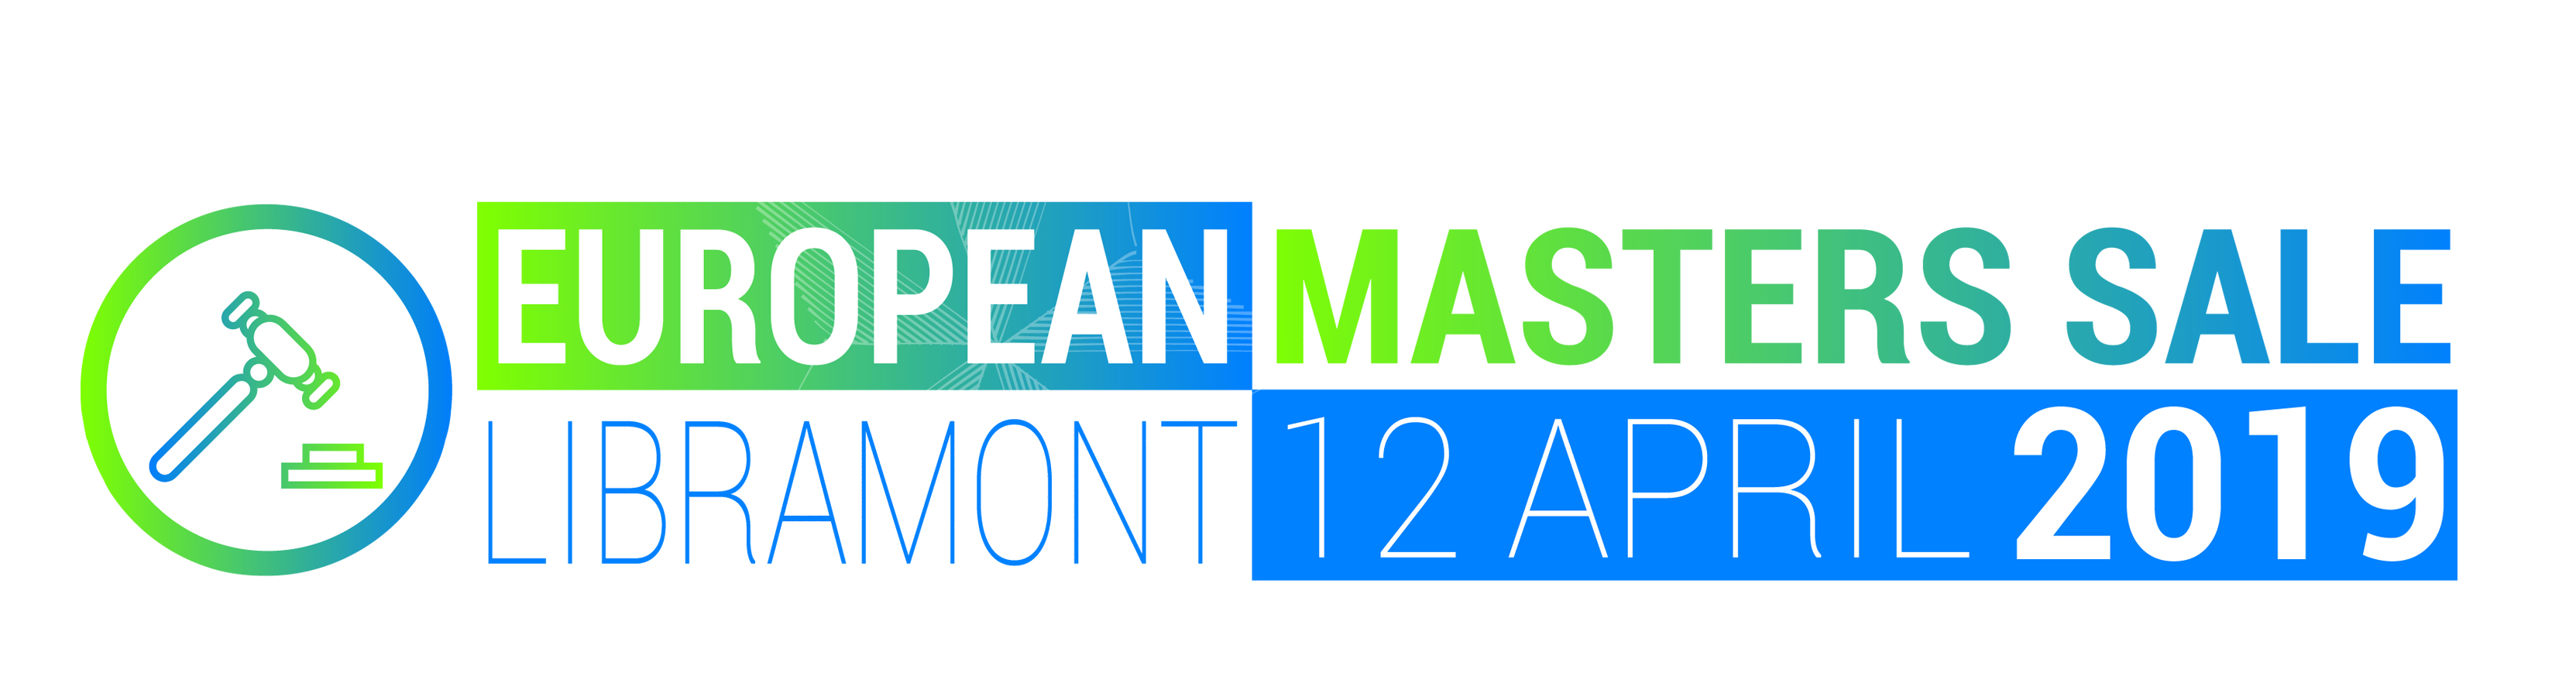 European Masters Sale